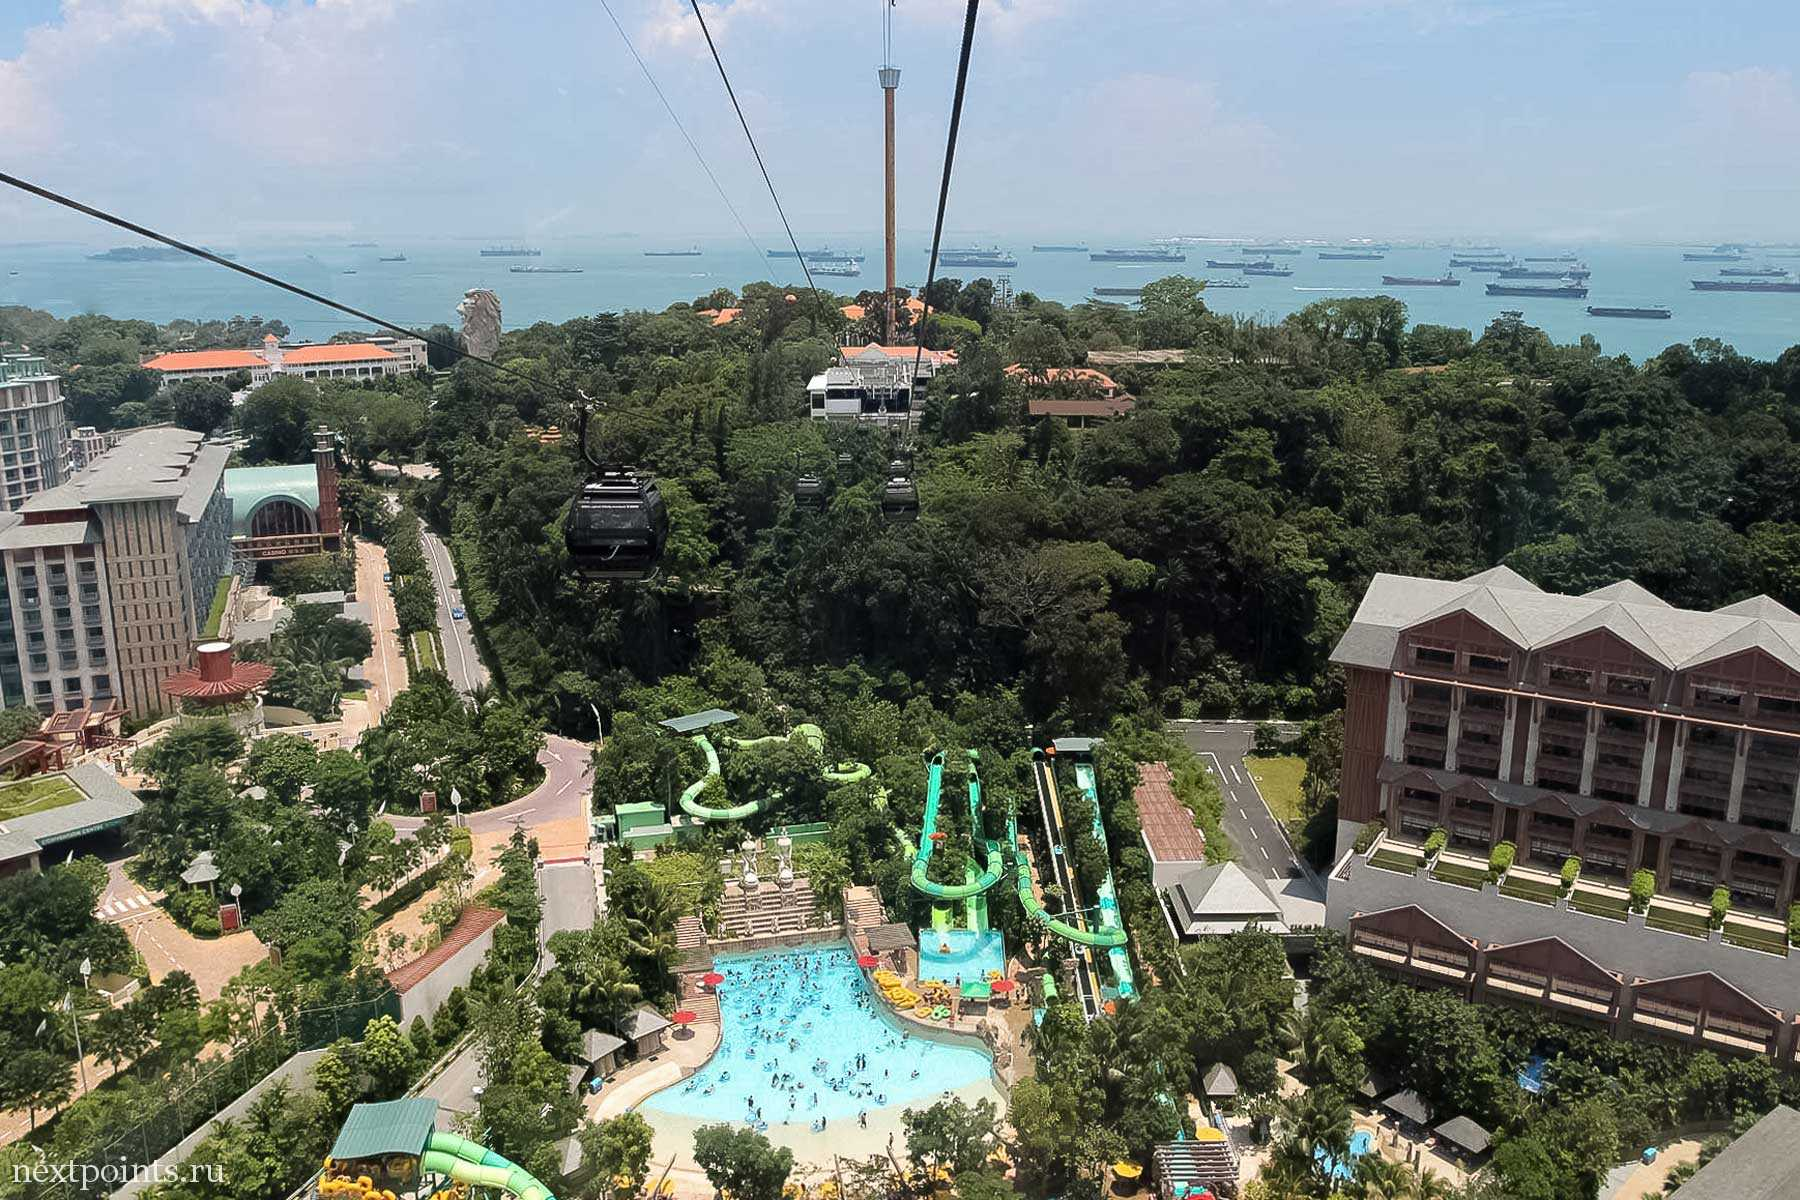 Сентоза (Sentosa) в Сингапуре (Singapore) - вид из кабинки фуникулера